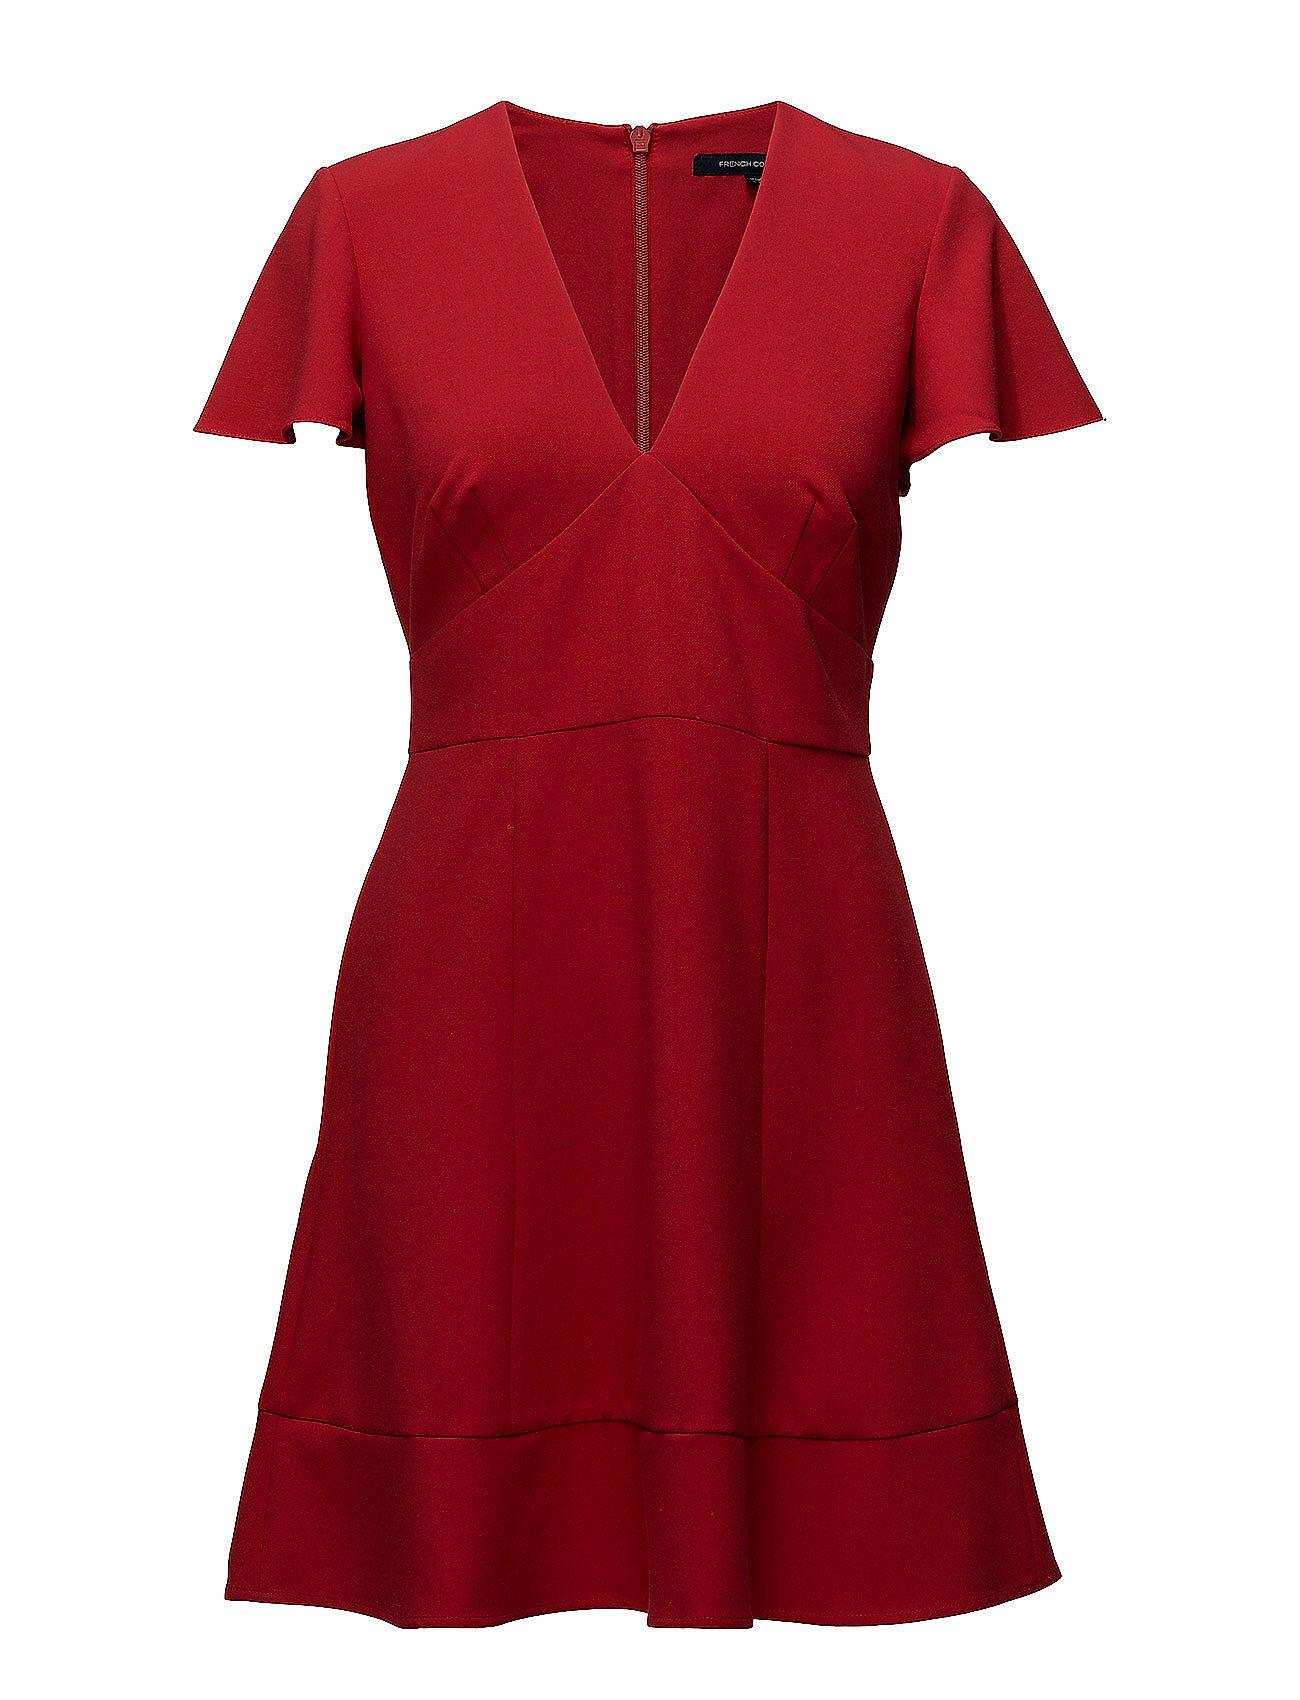 French Connection Whisper Ruth Short Sleeve V-Neck Flared Dress